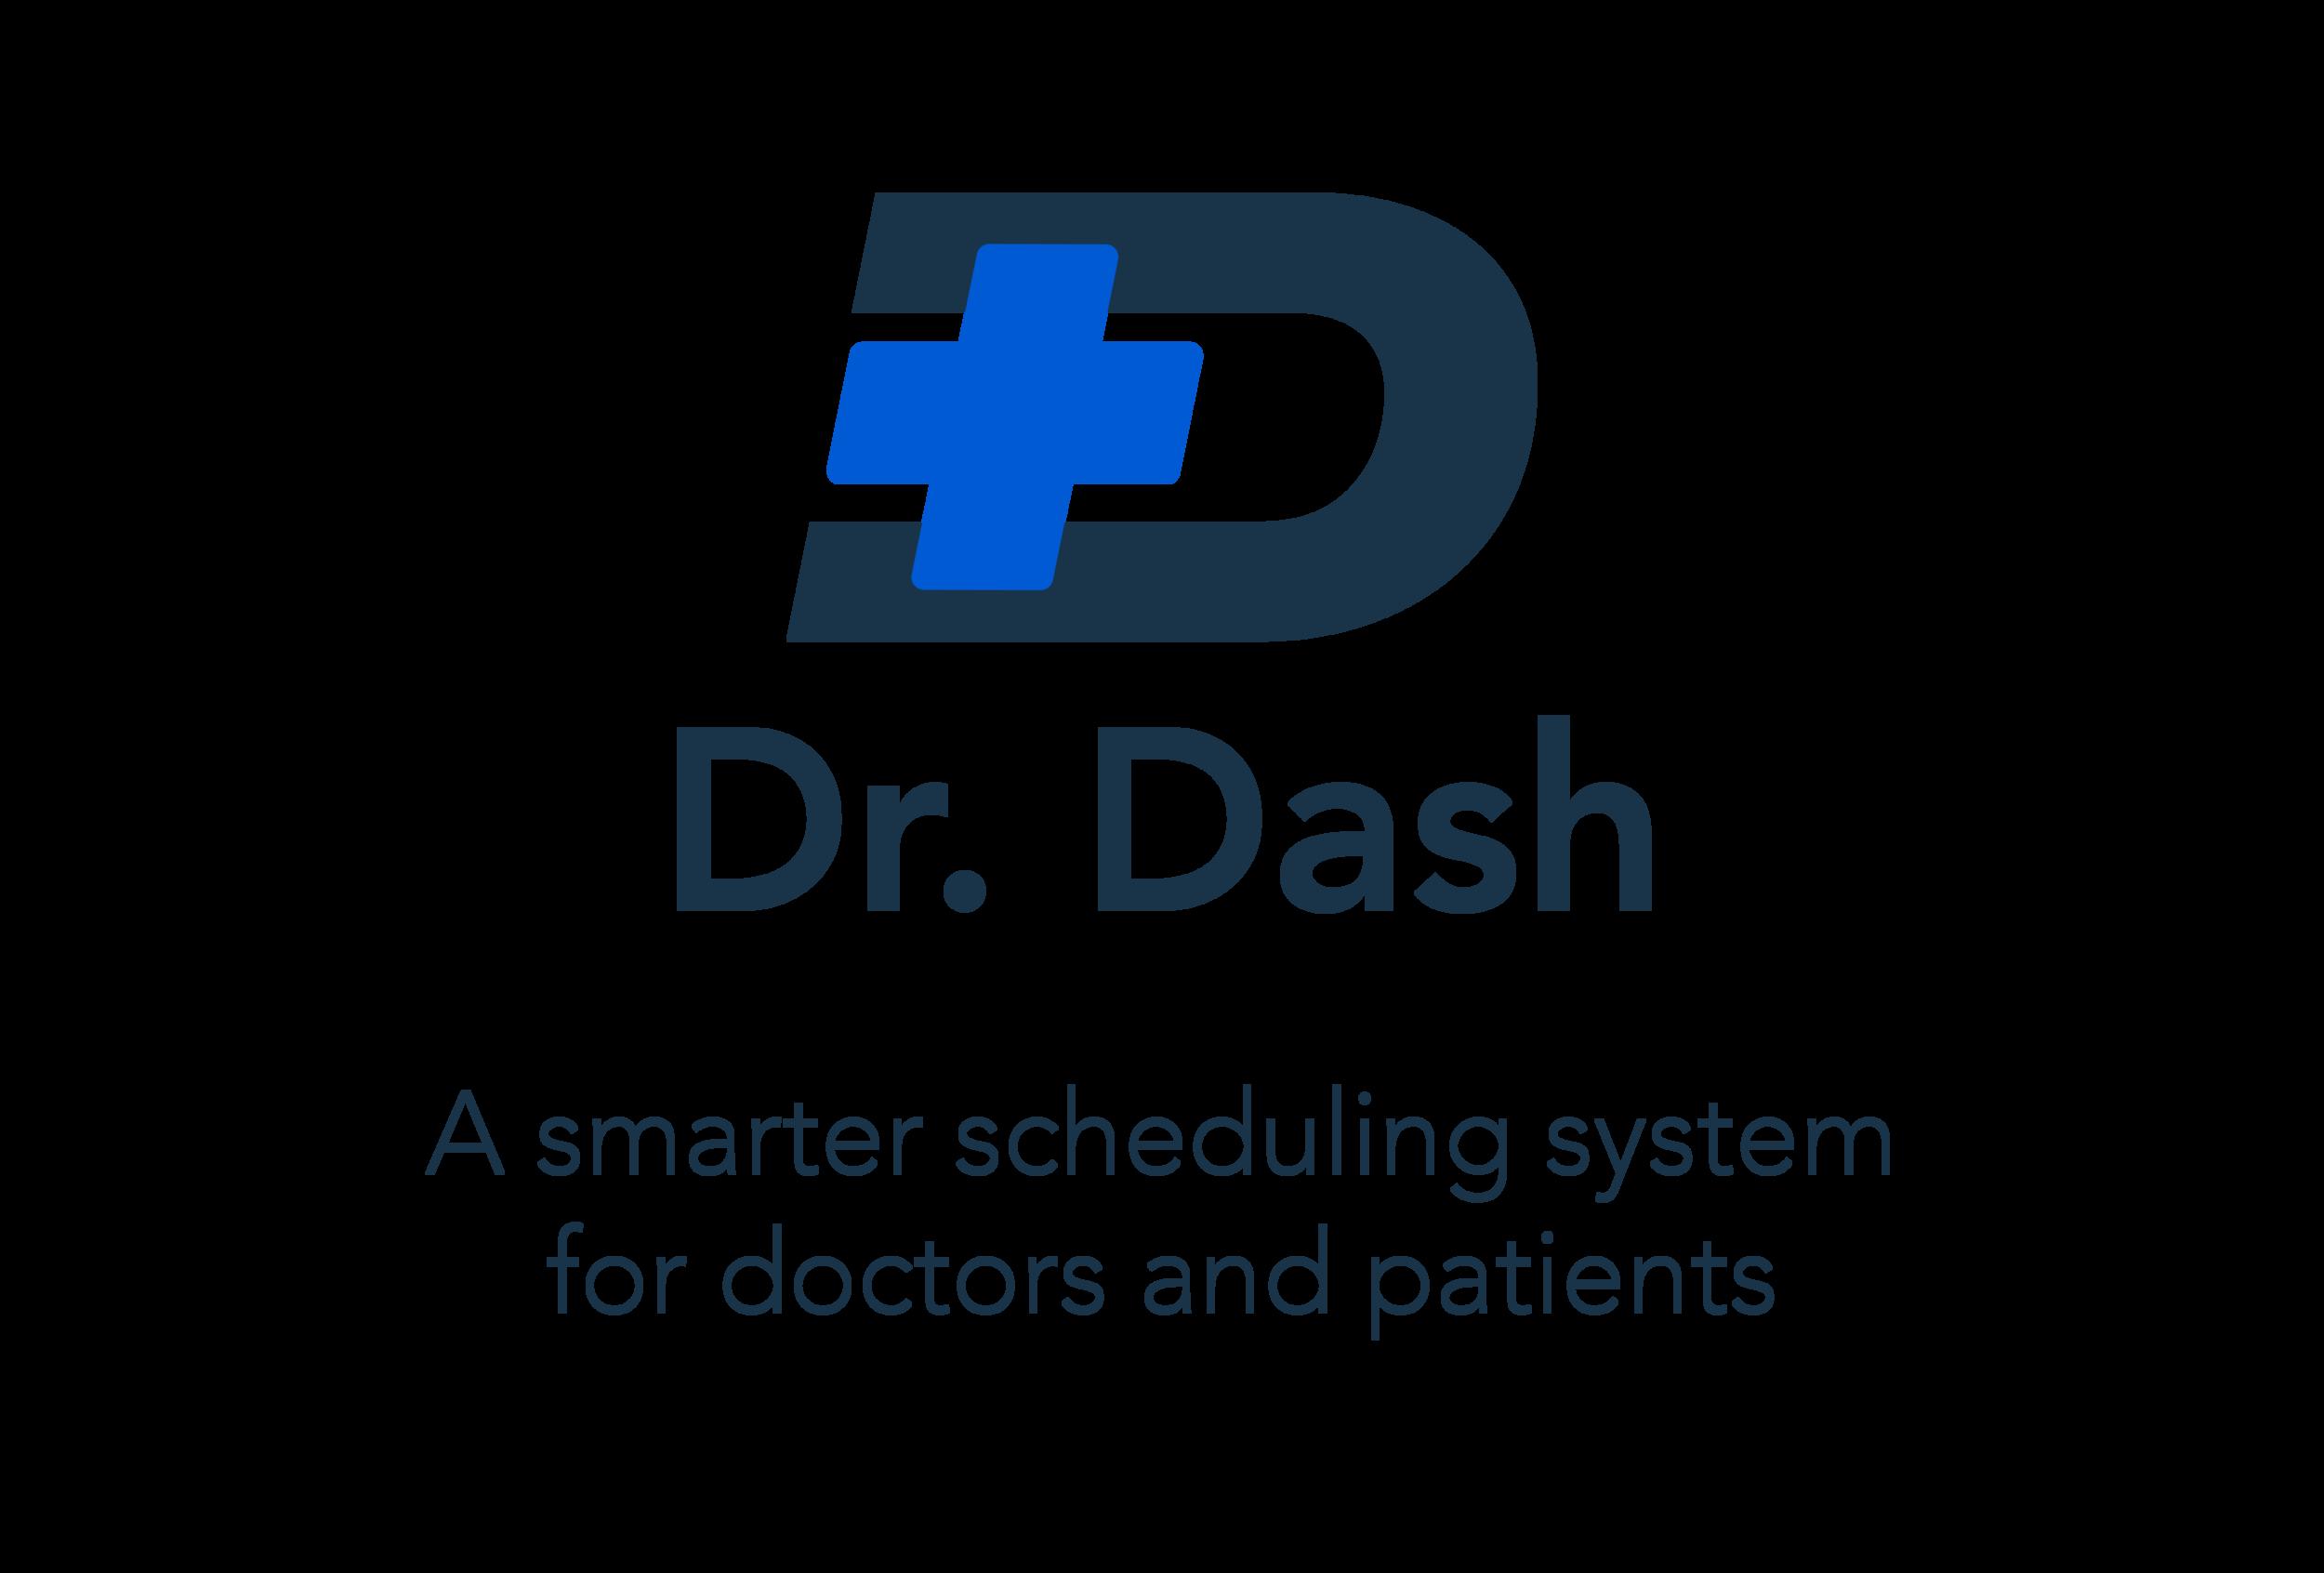 dr dash banner1-03.png